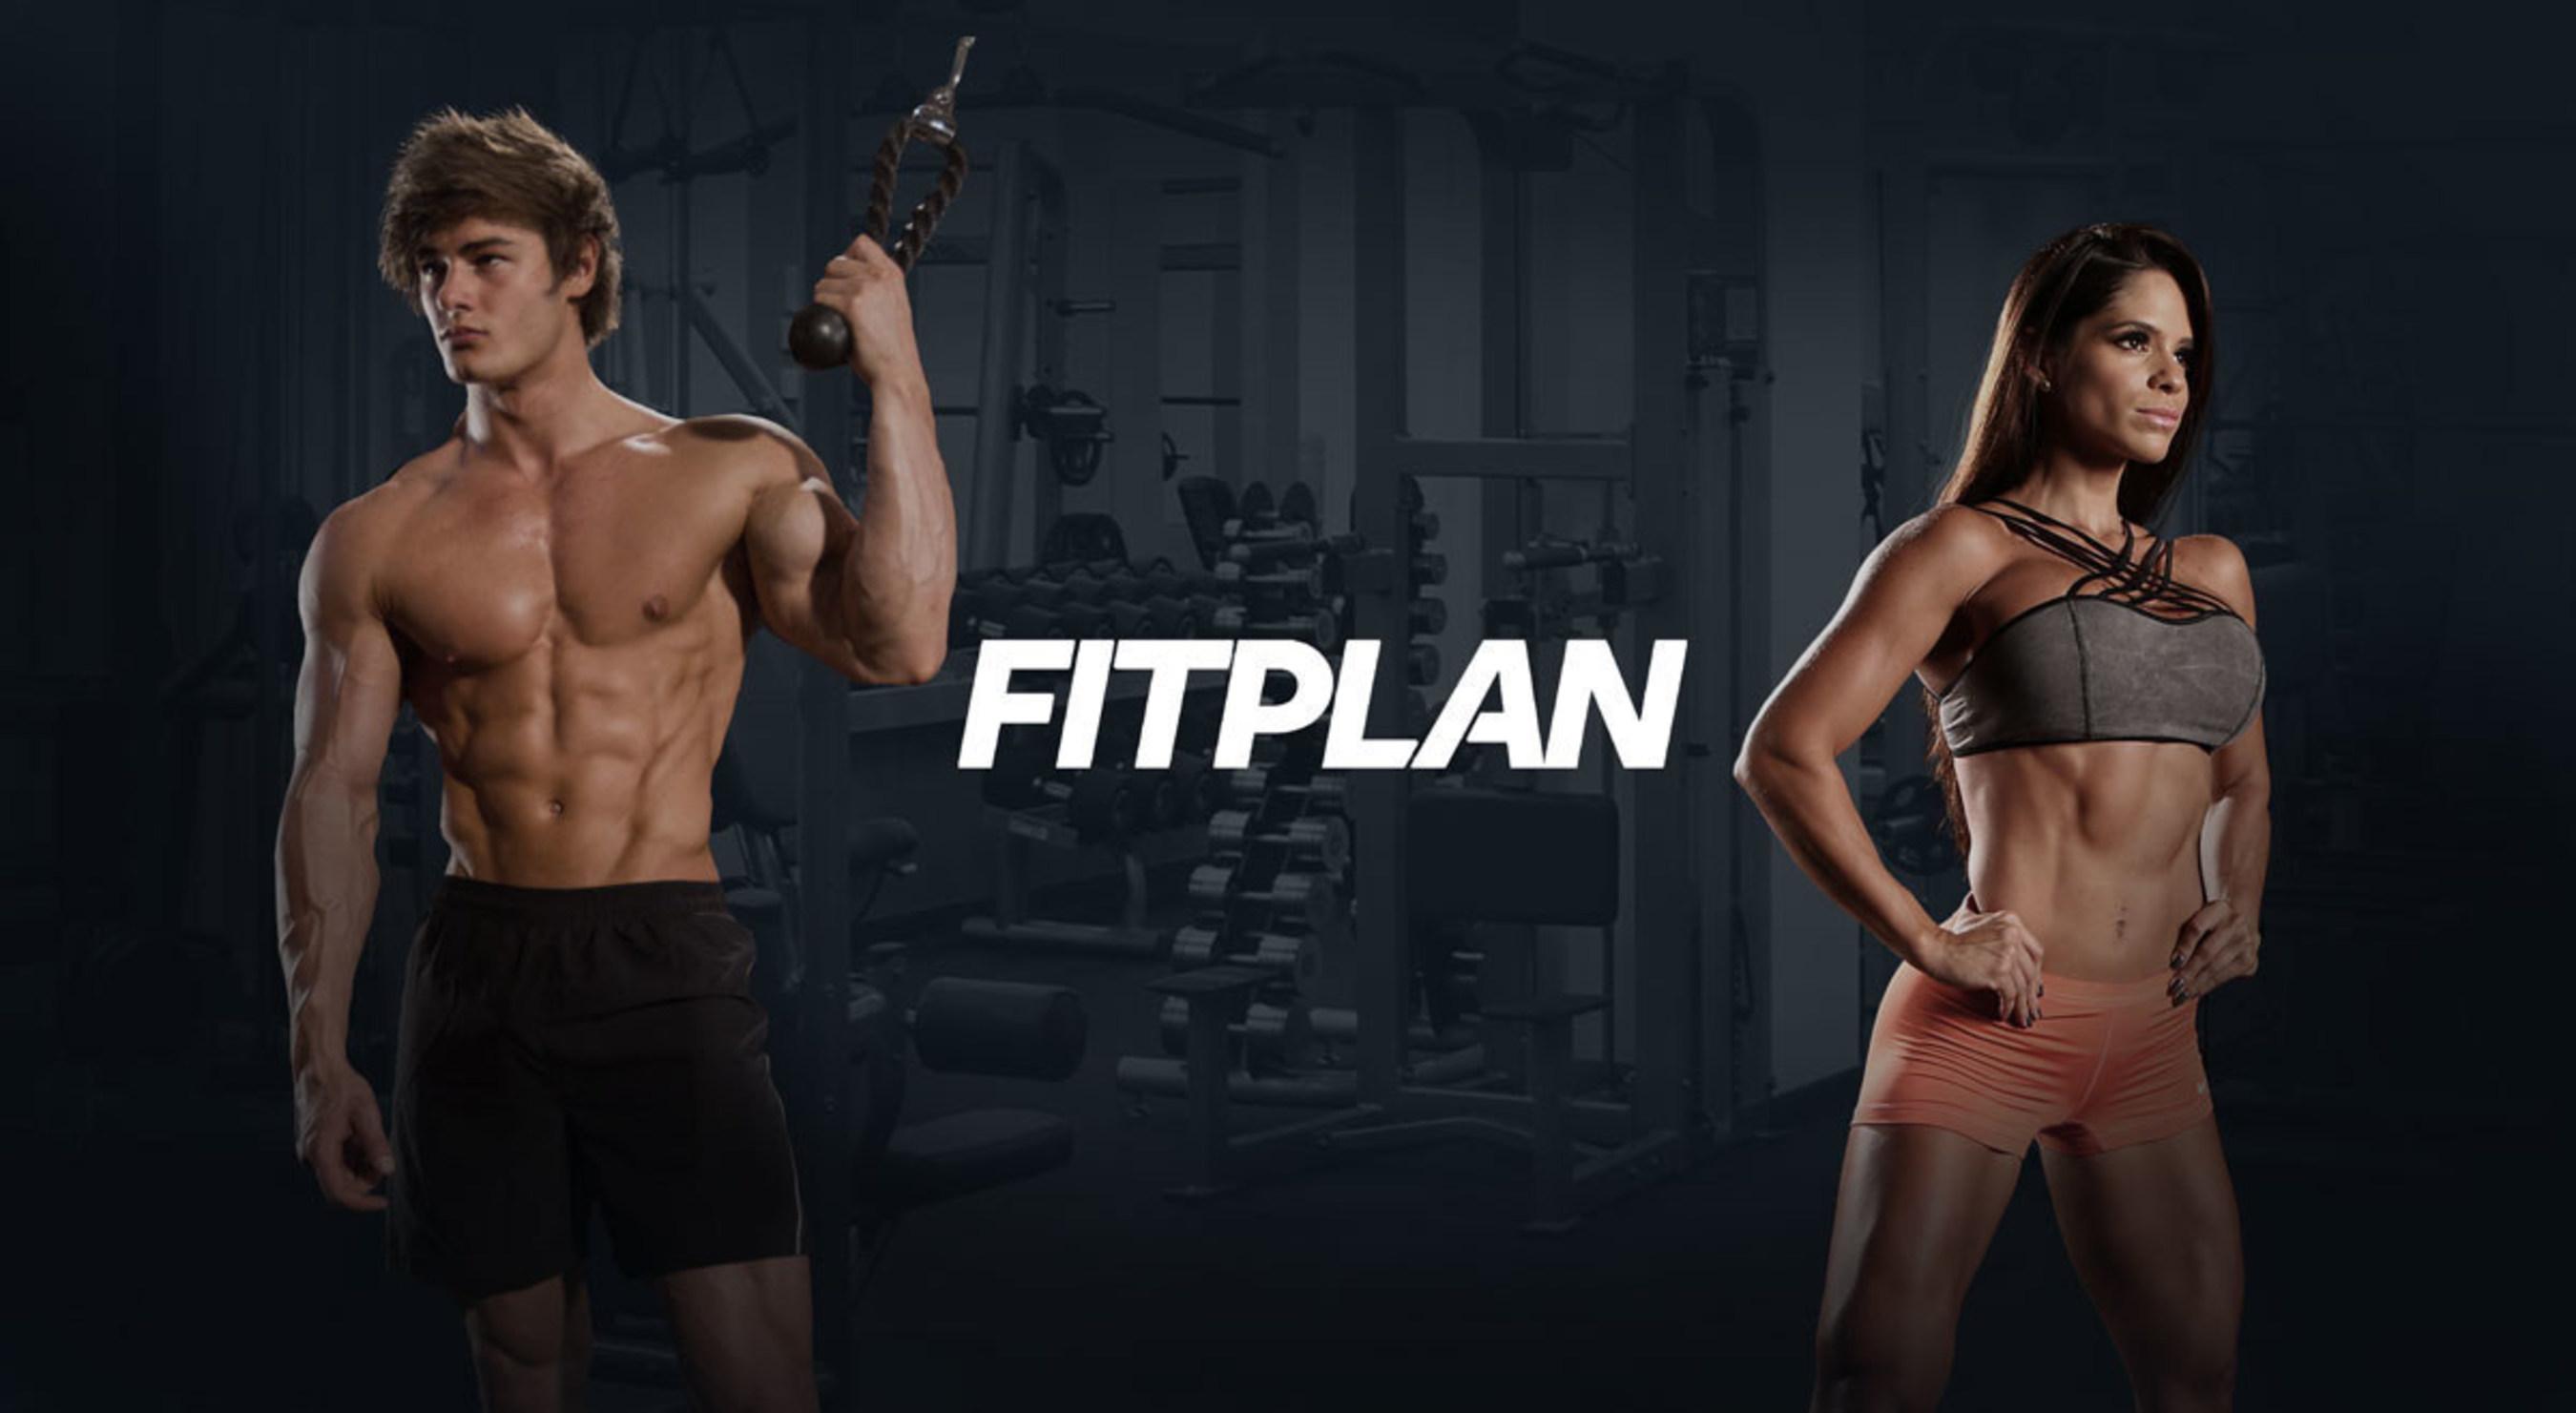 A Fitplan gym banner.